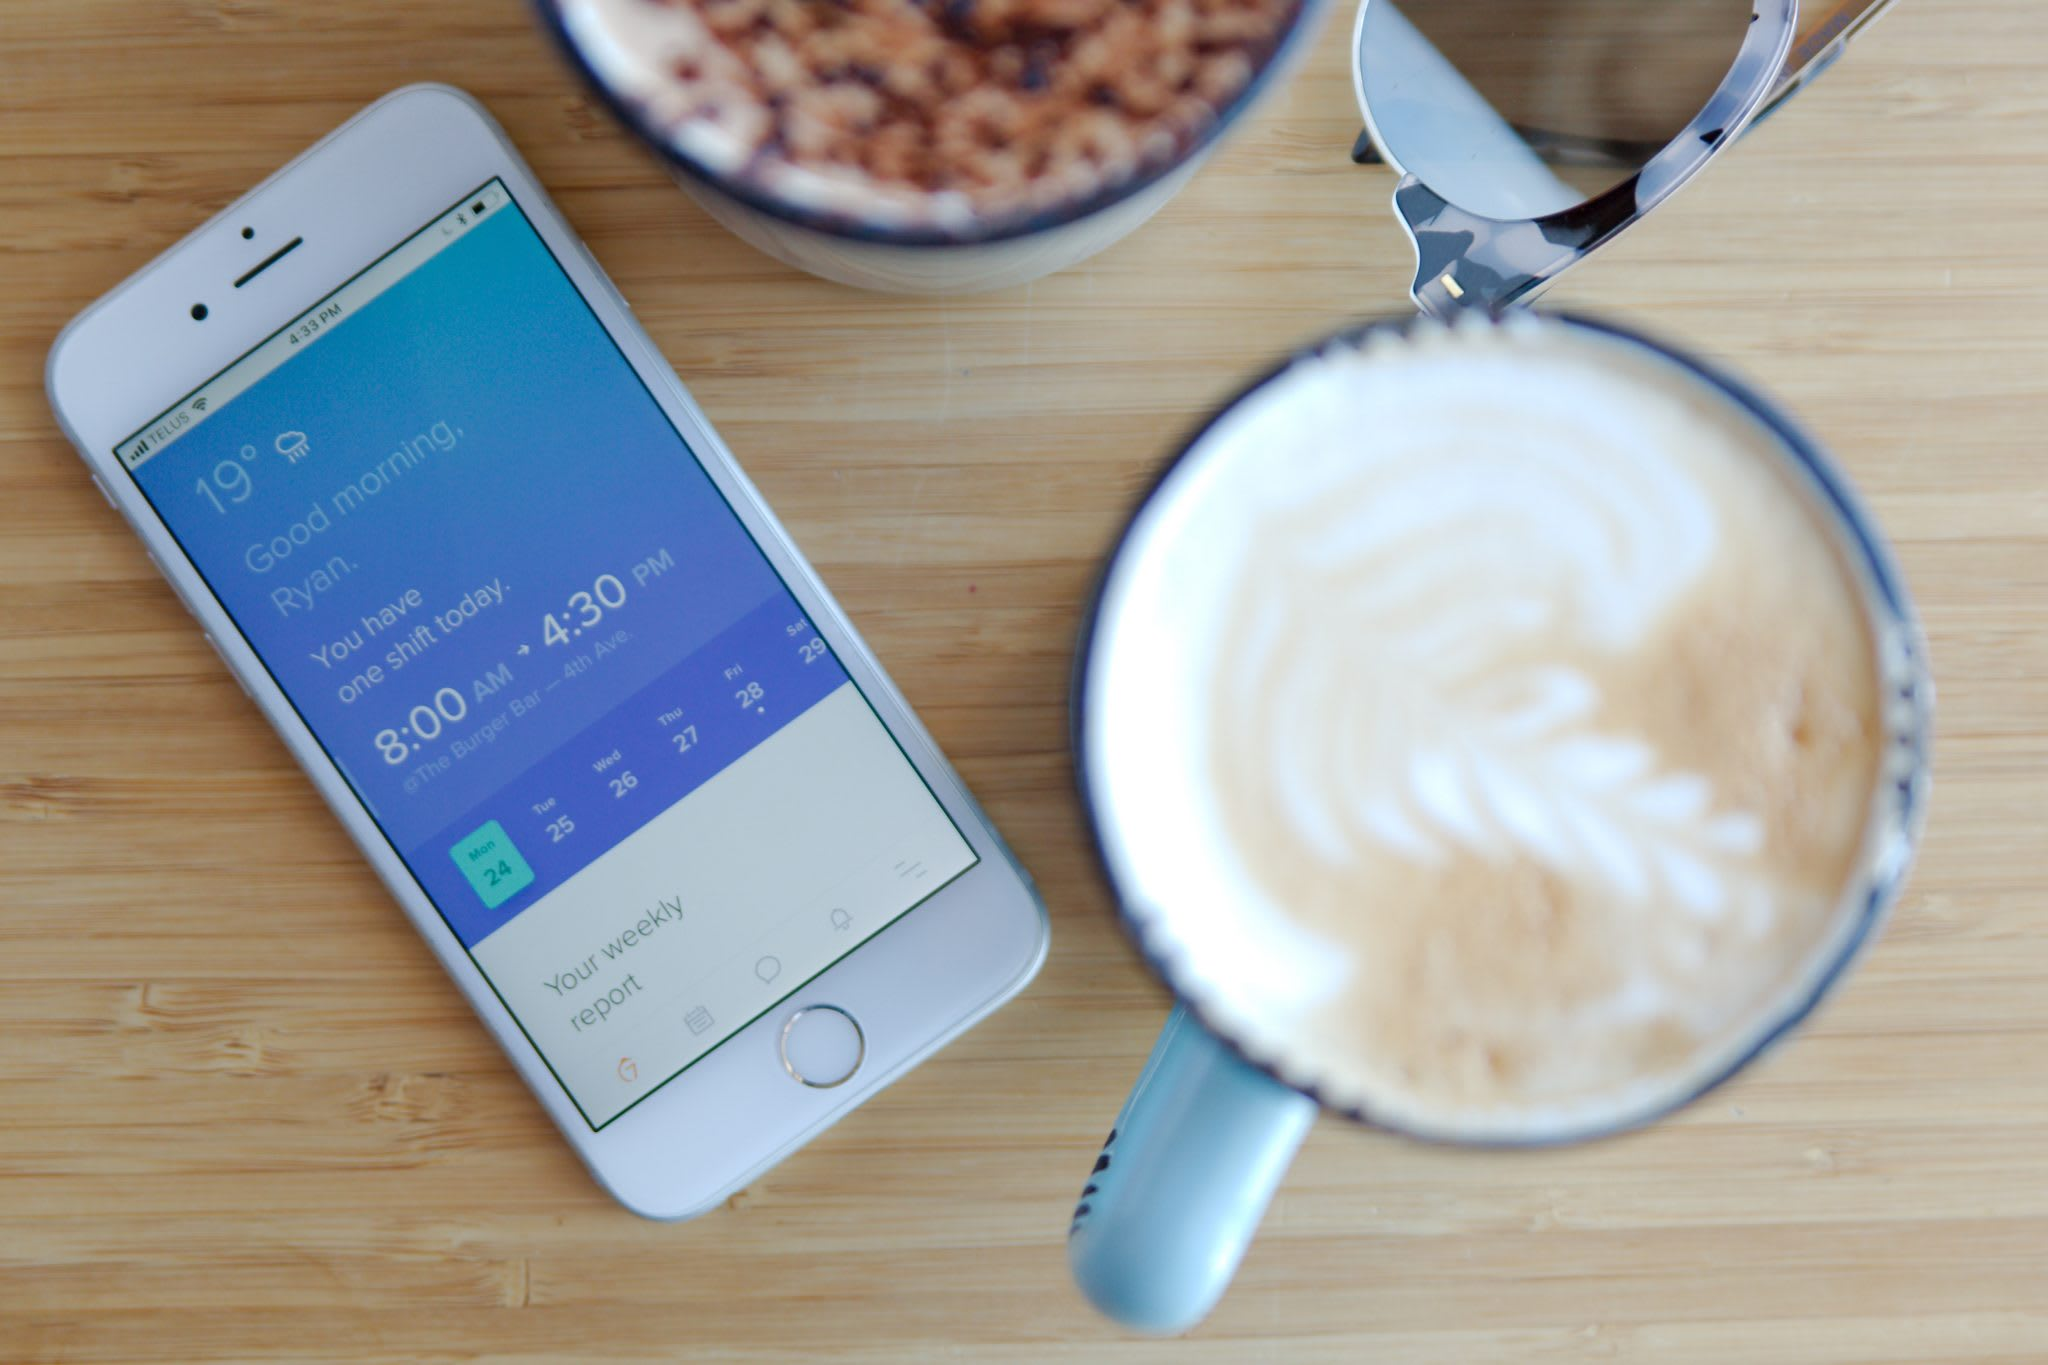 iphone, coffee, table